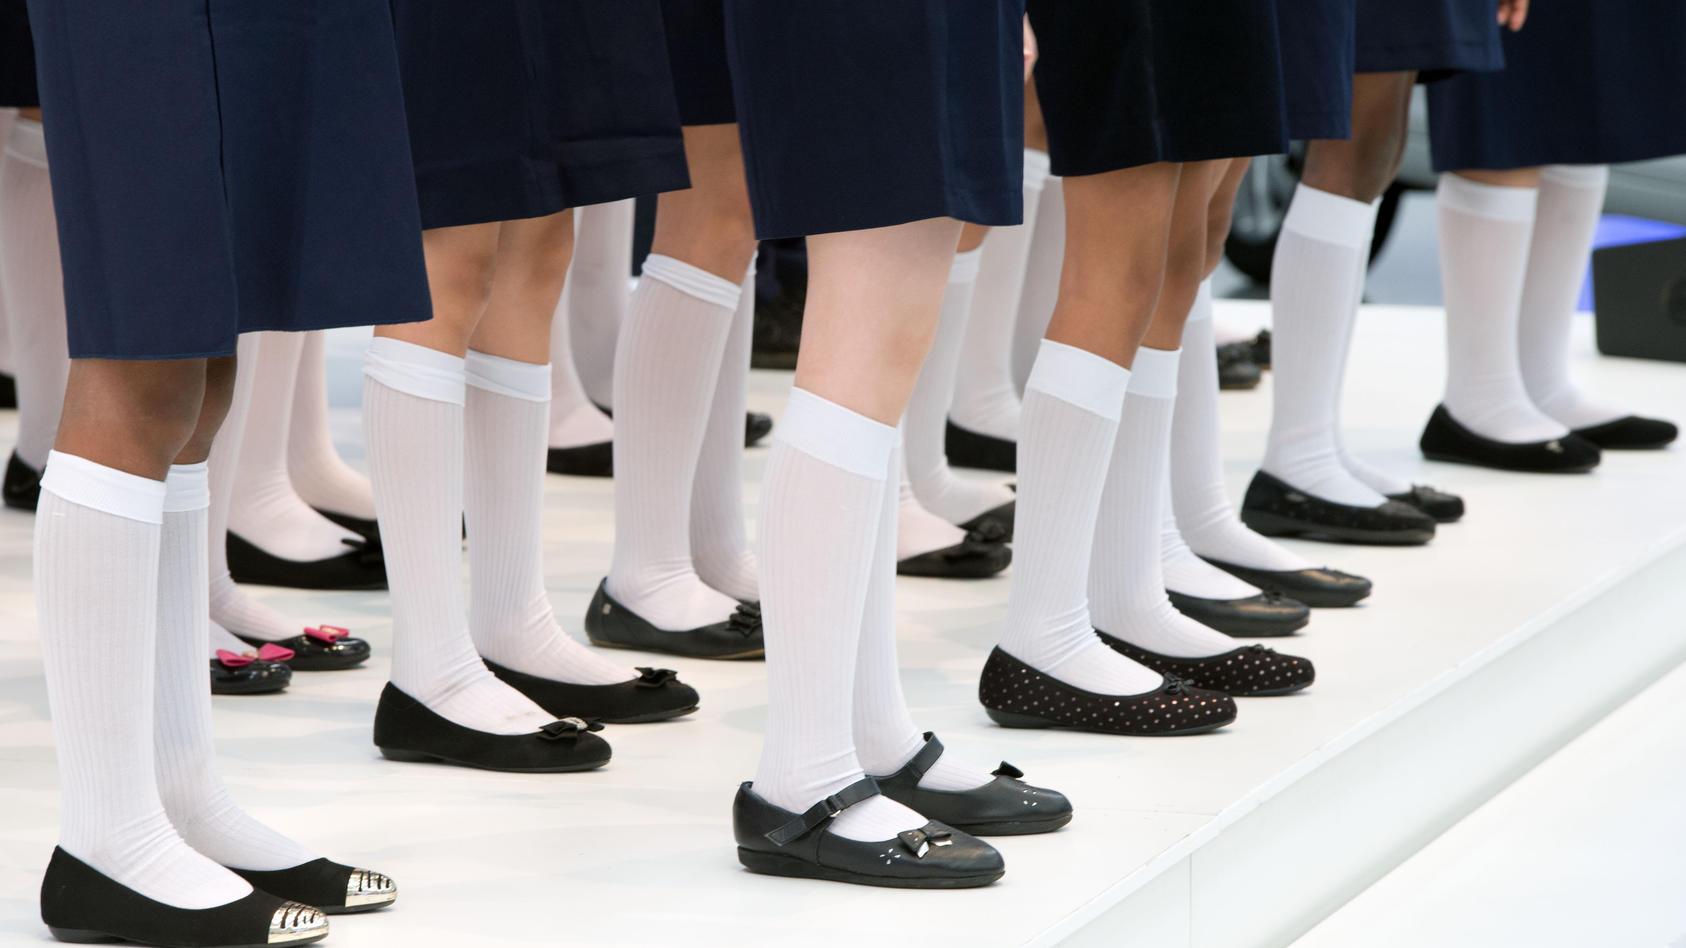 Skandal an Privatschule: Mädchen mussten knien, um Rocklänge messen zu lassen (Symbolbild).